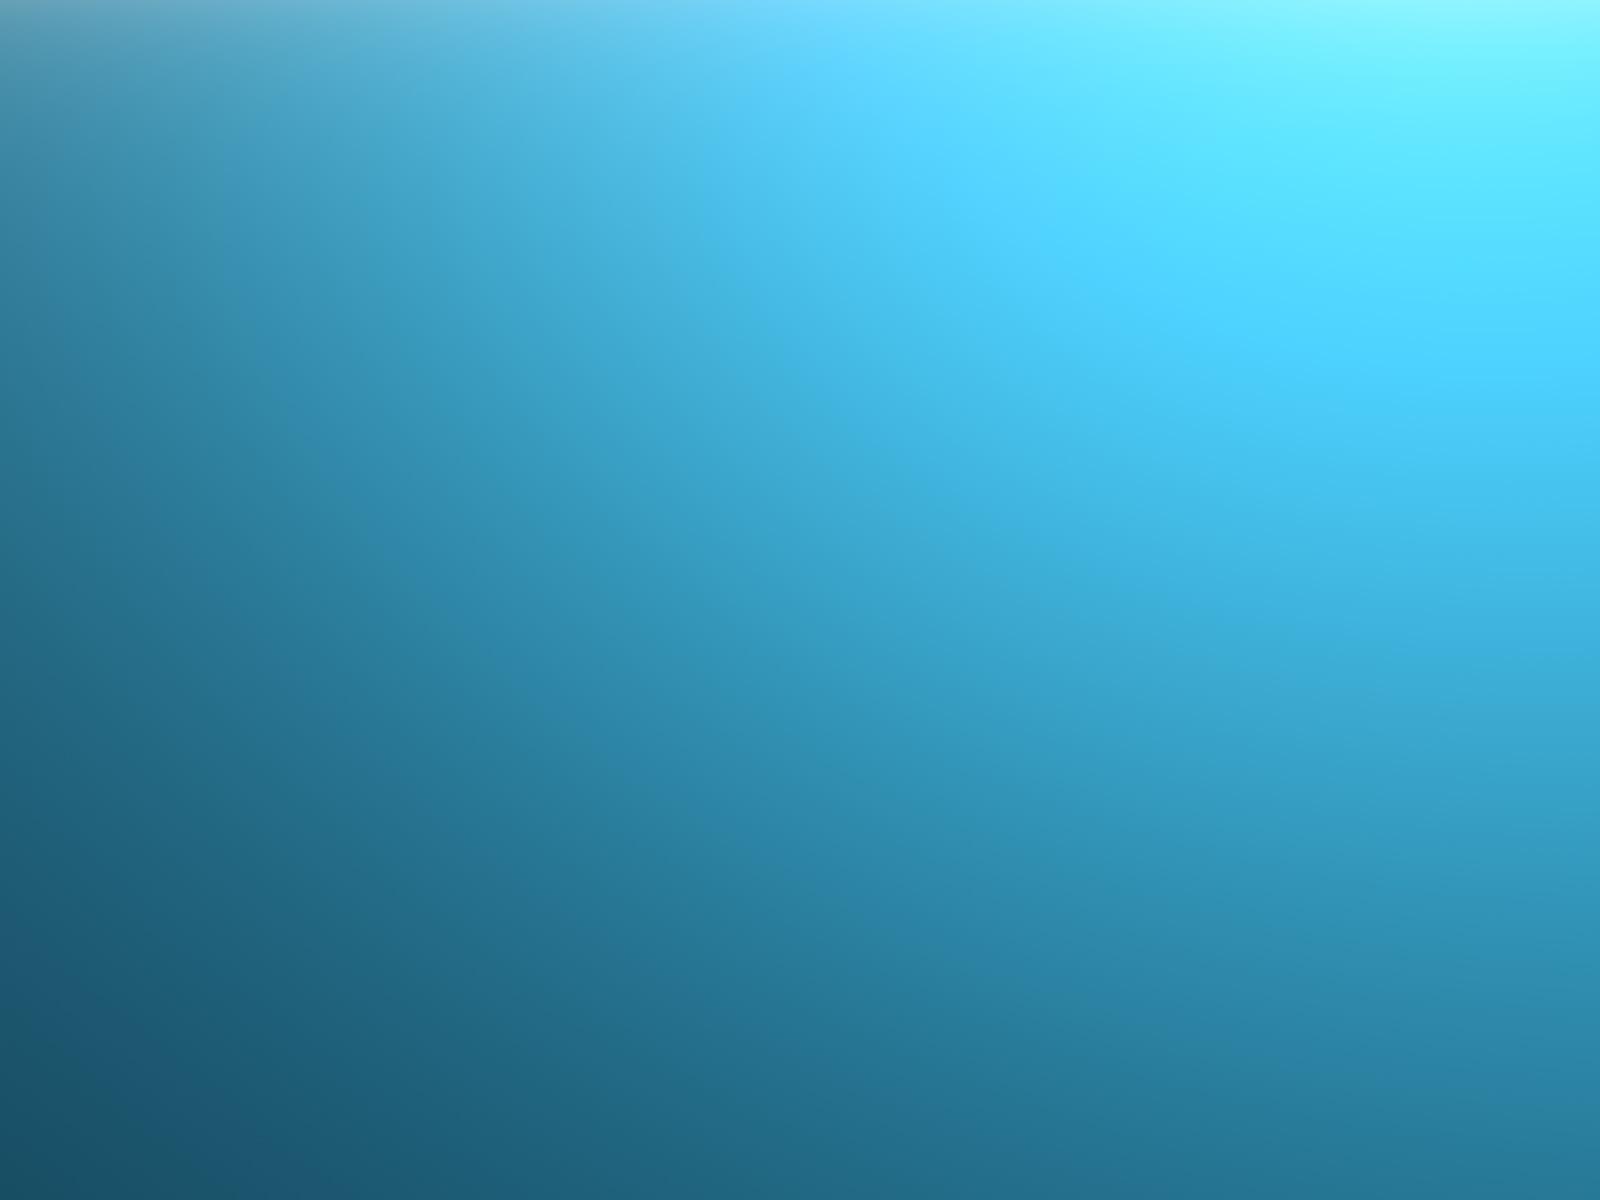 Plain Light Blue Backgrounds wallpaper Plain Light Blue Backgrounds 1600x1200